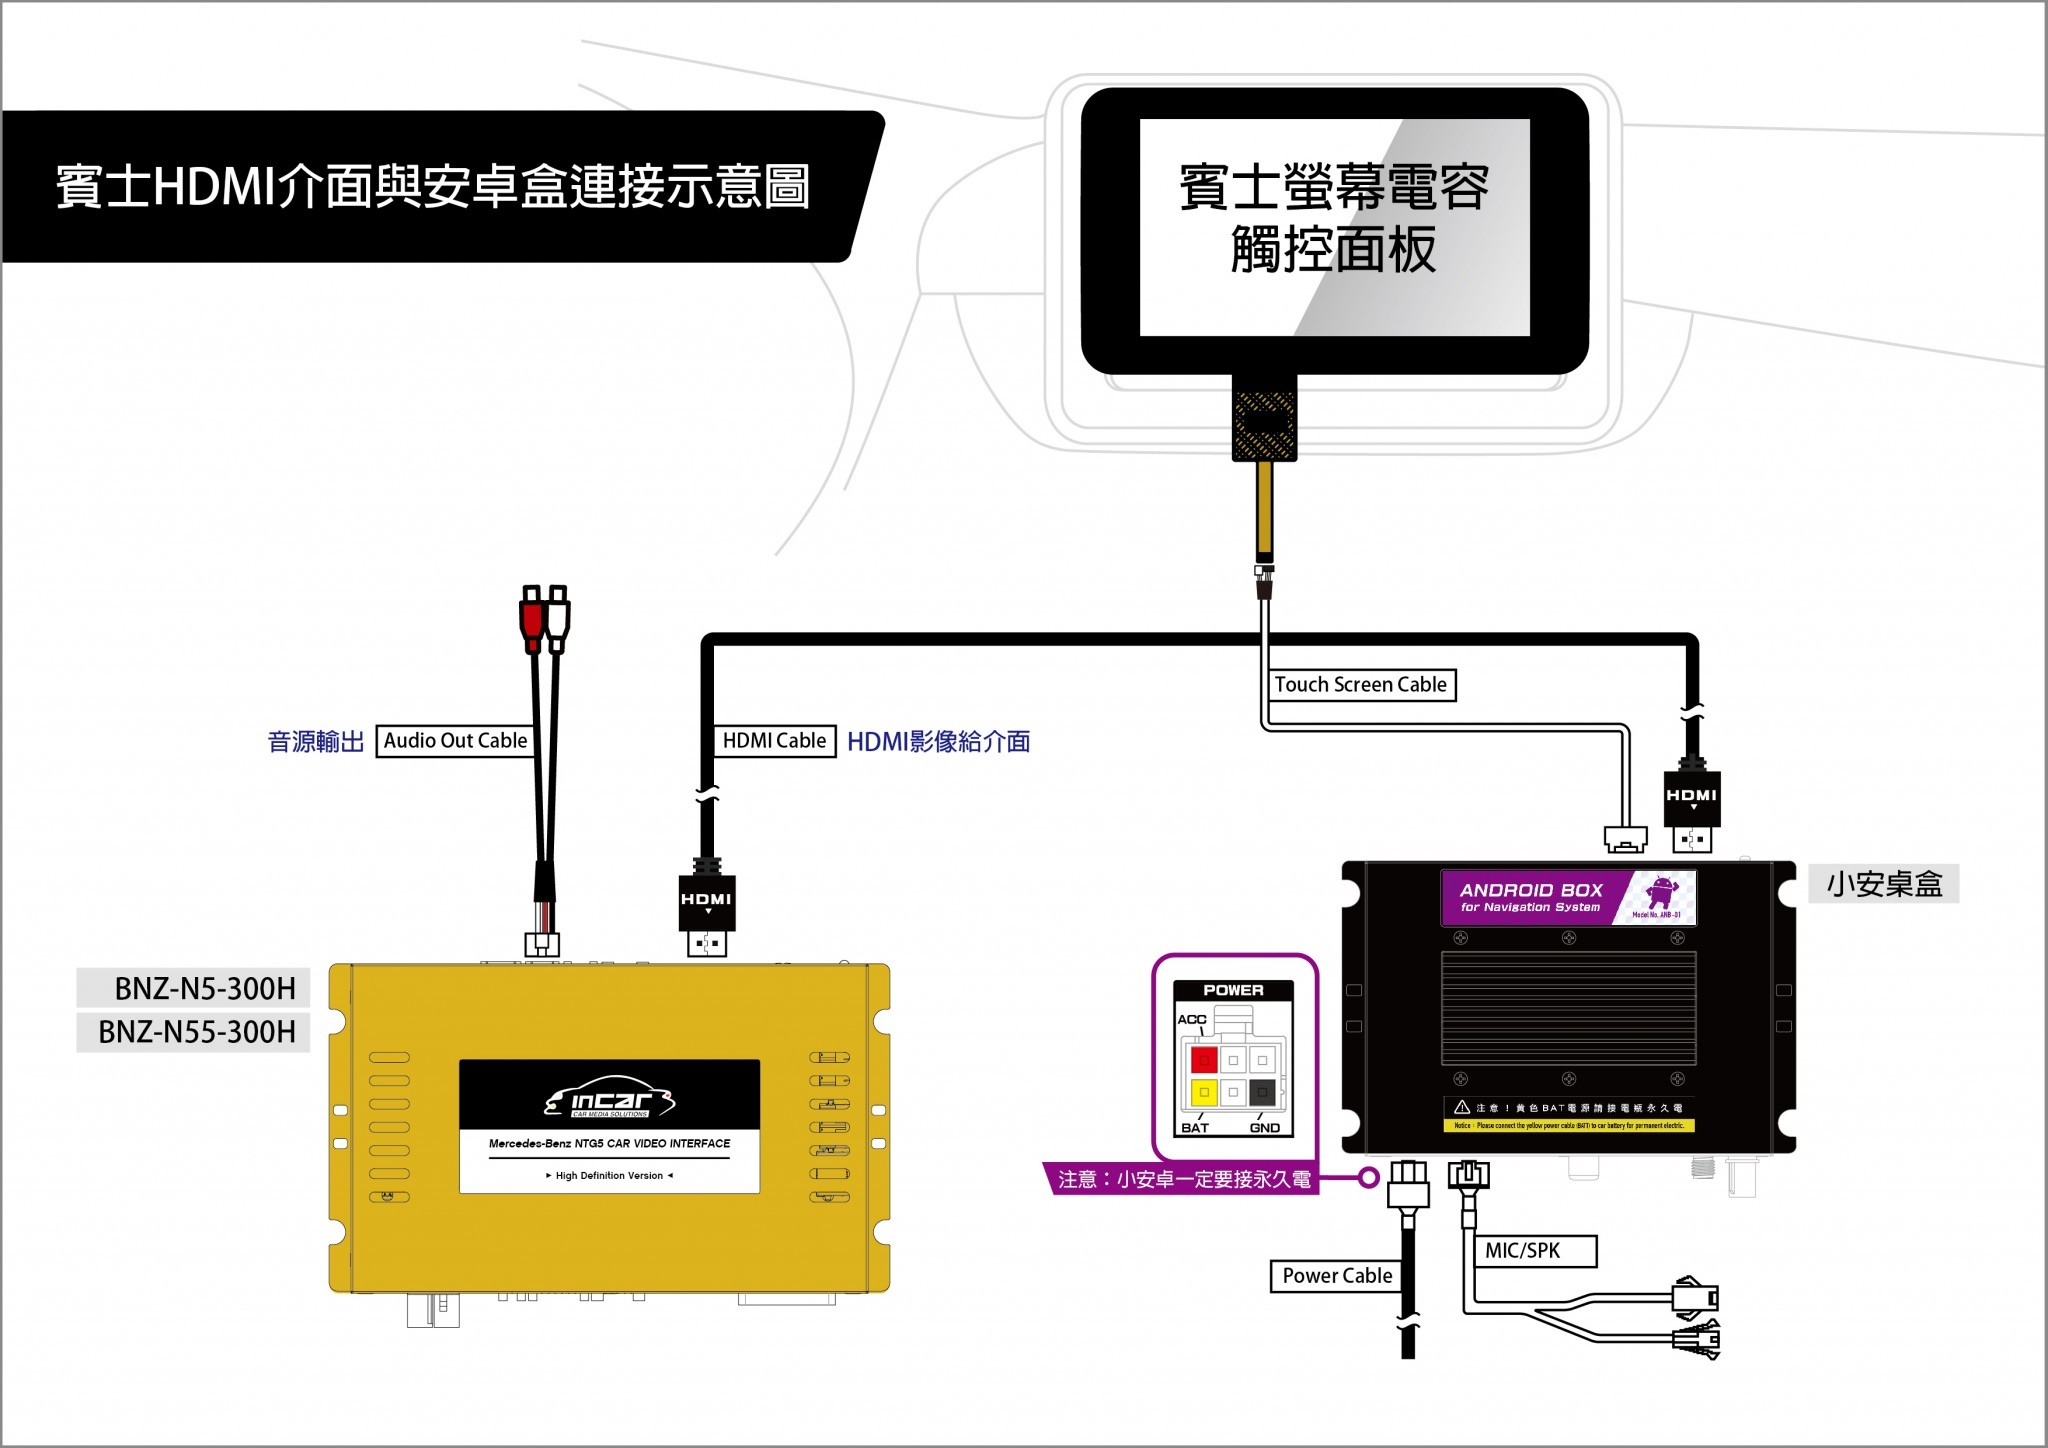 HDMI+NaviBox-01